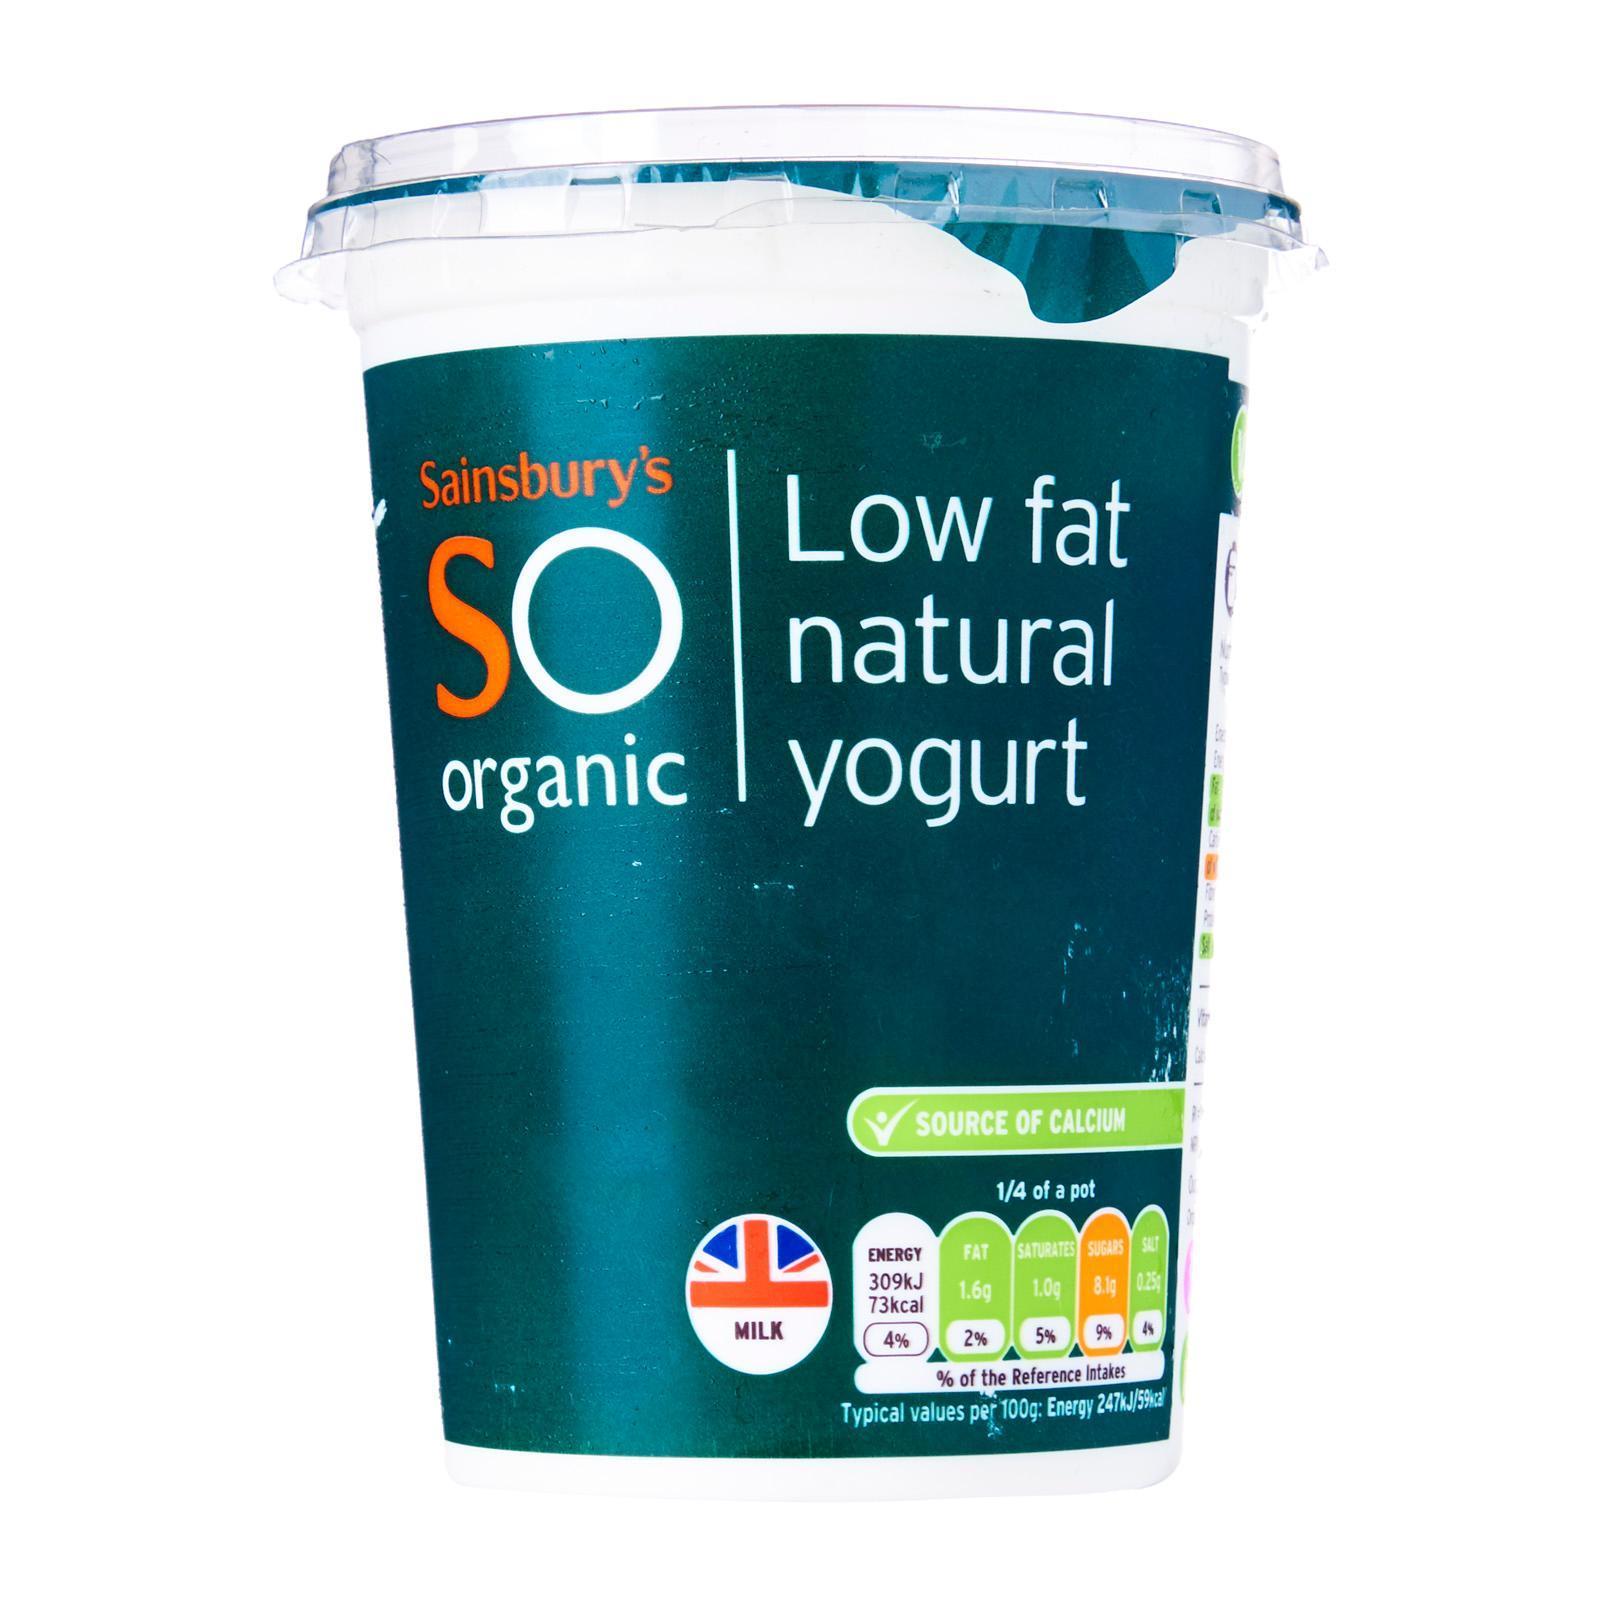 Sainsbury's So Organic Low Fat Natural Yogurt